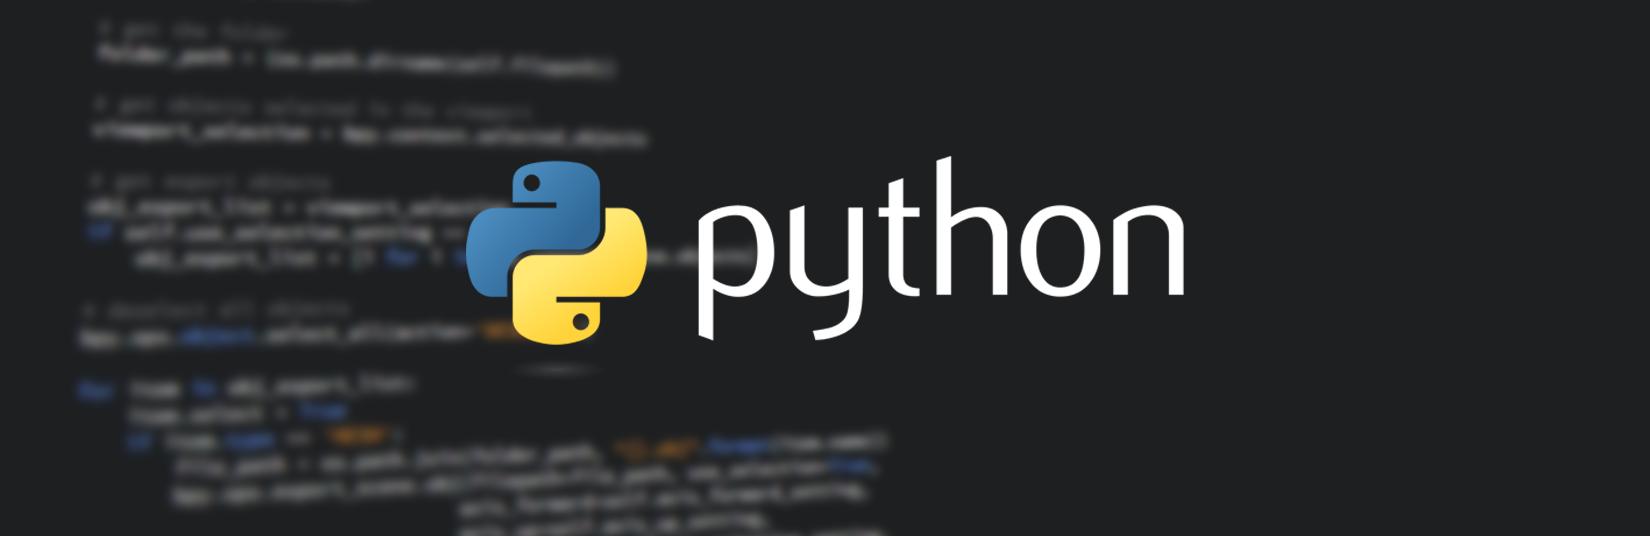 Python Web Development Services